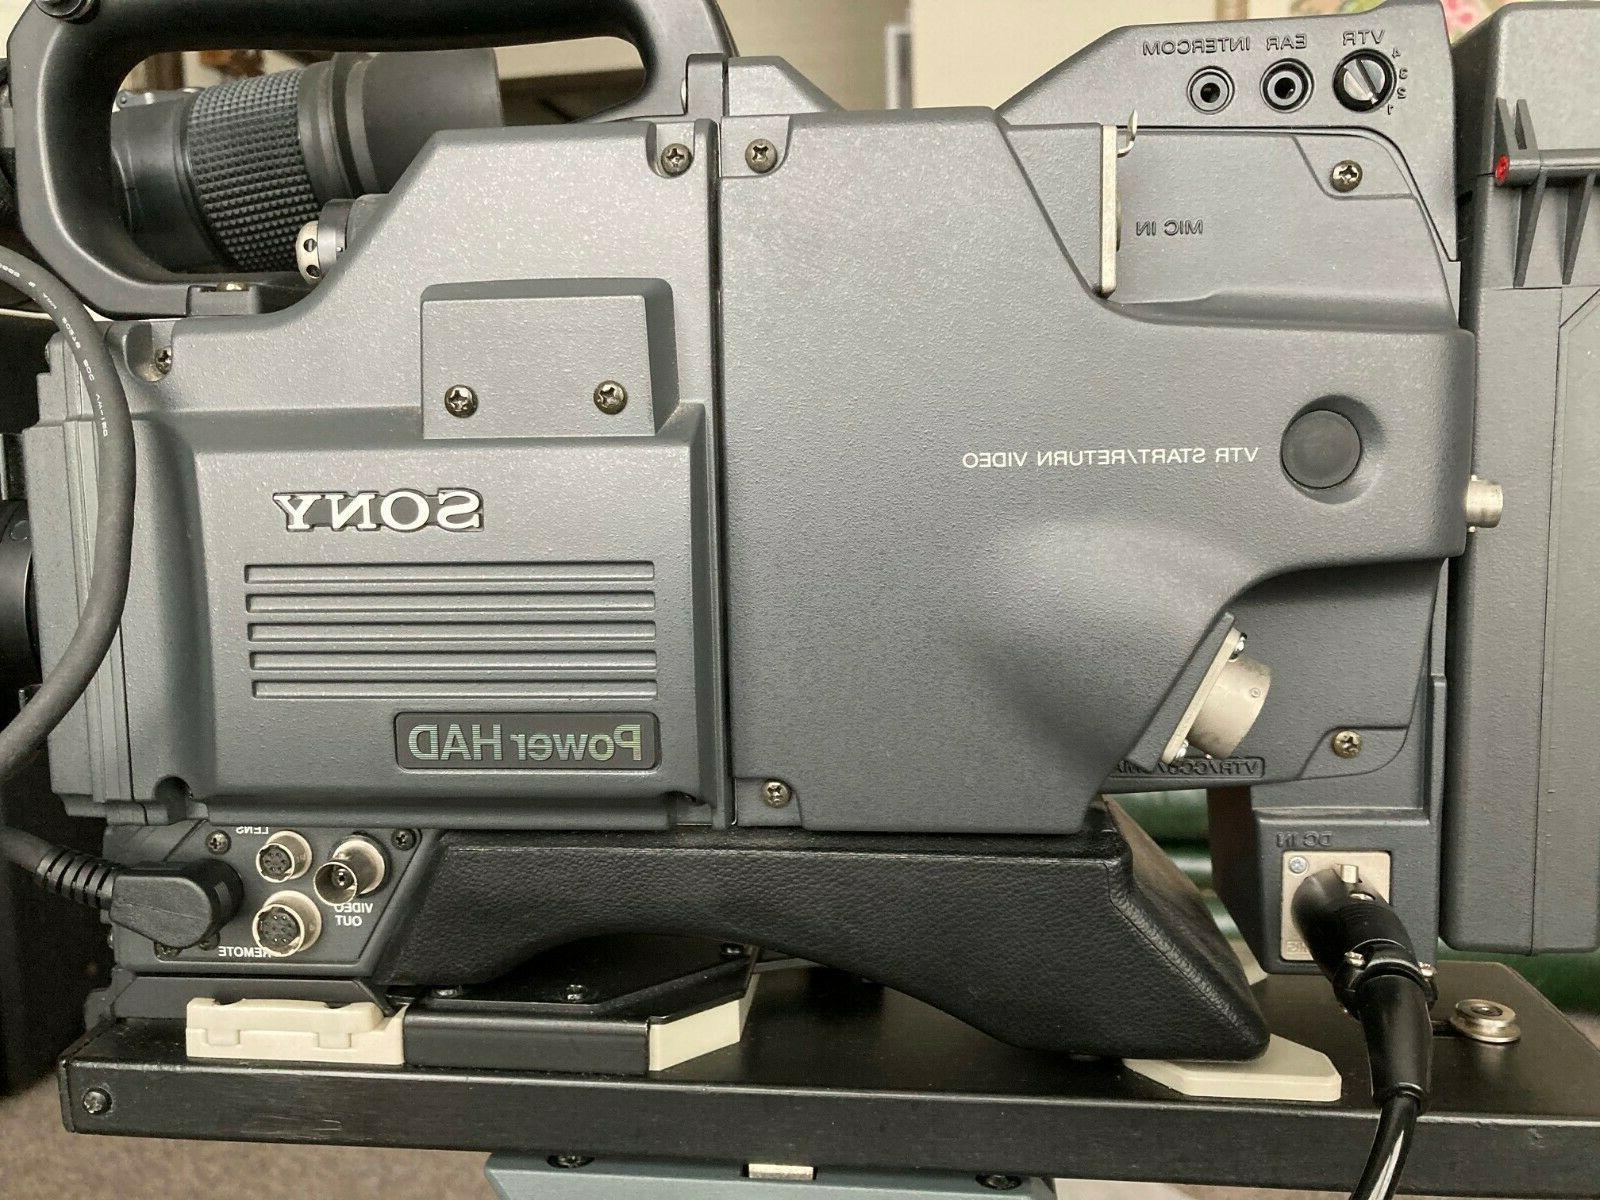 SONYdxc-327a camera adptor lens